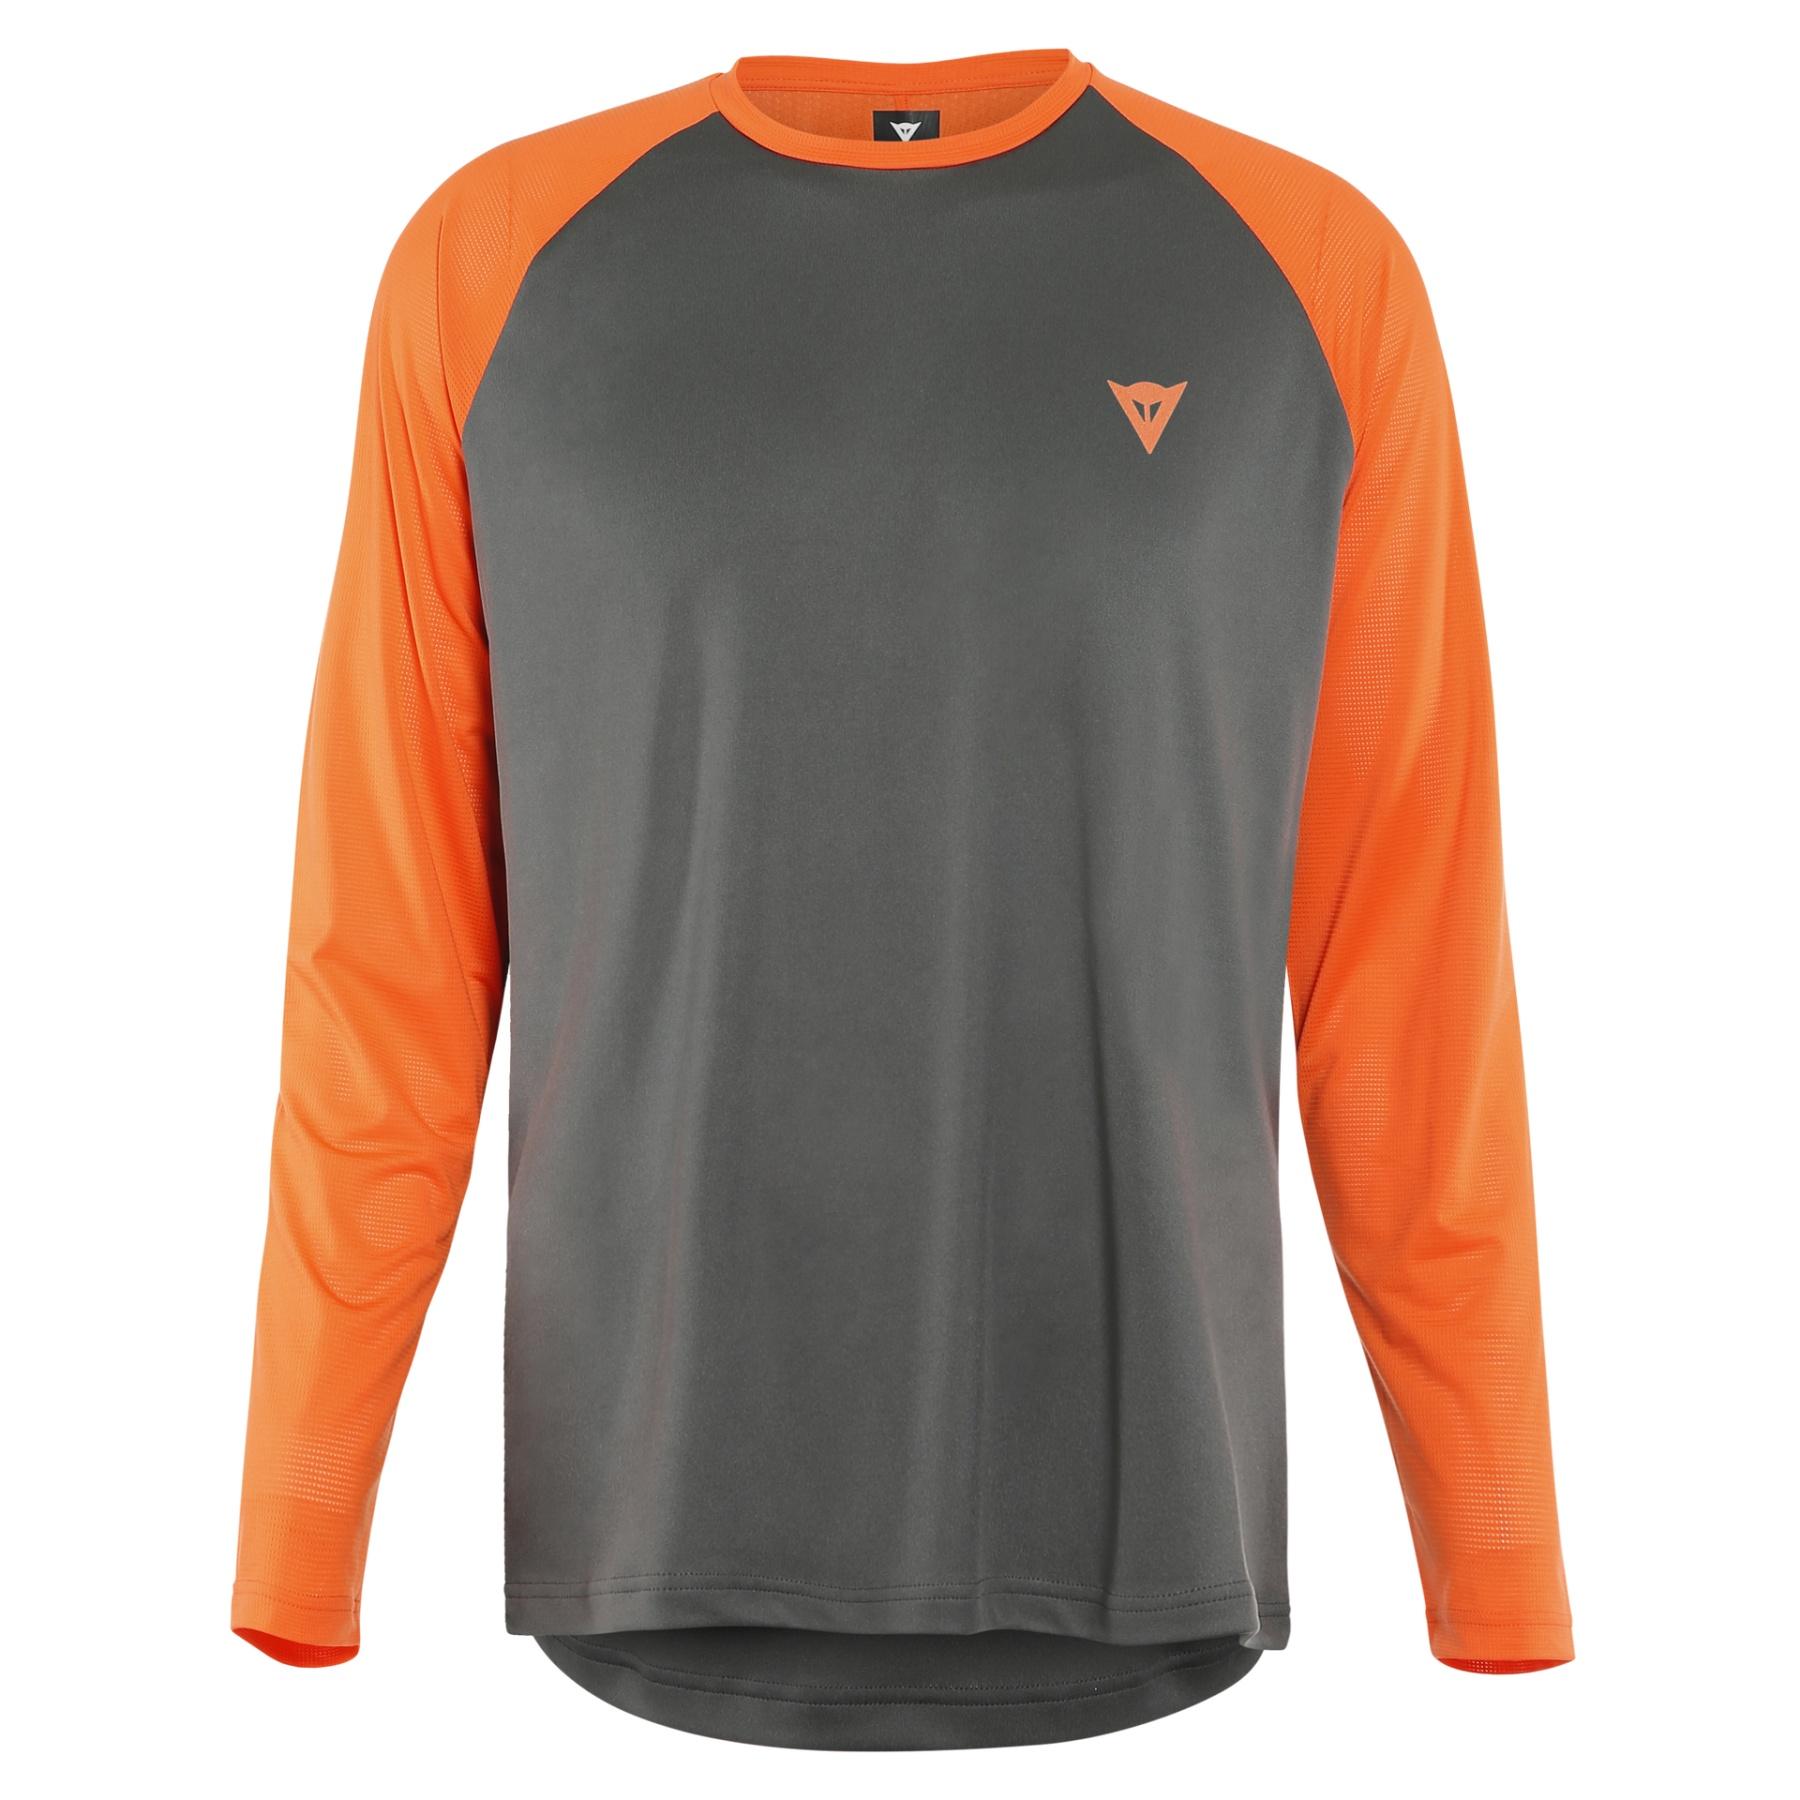 Picture of Dainese HG Tsingy MTB Longsleeve Jersey - dark-gray/orange